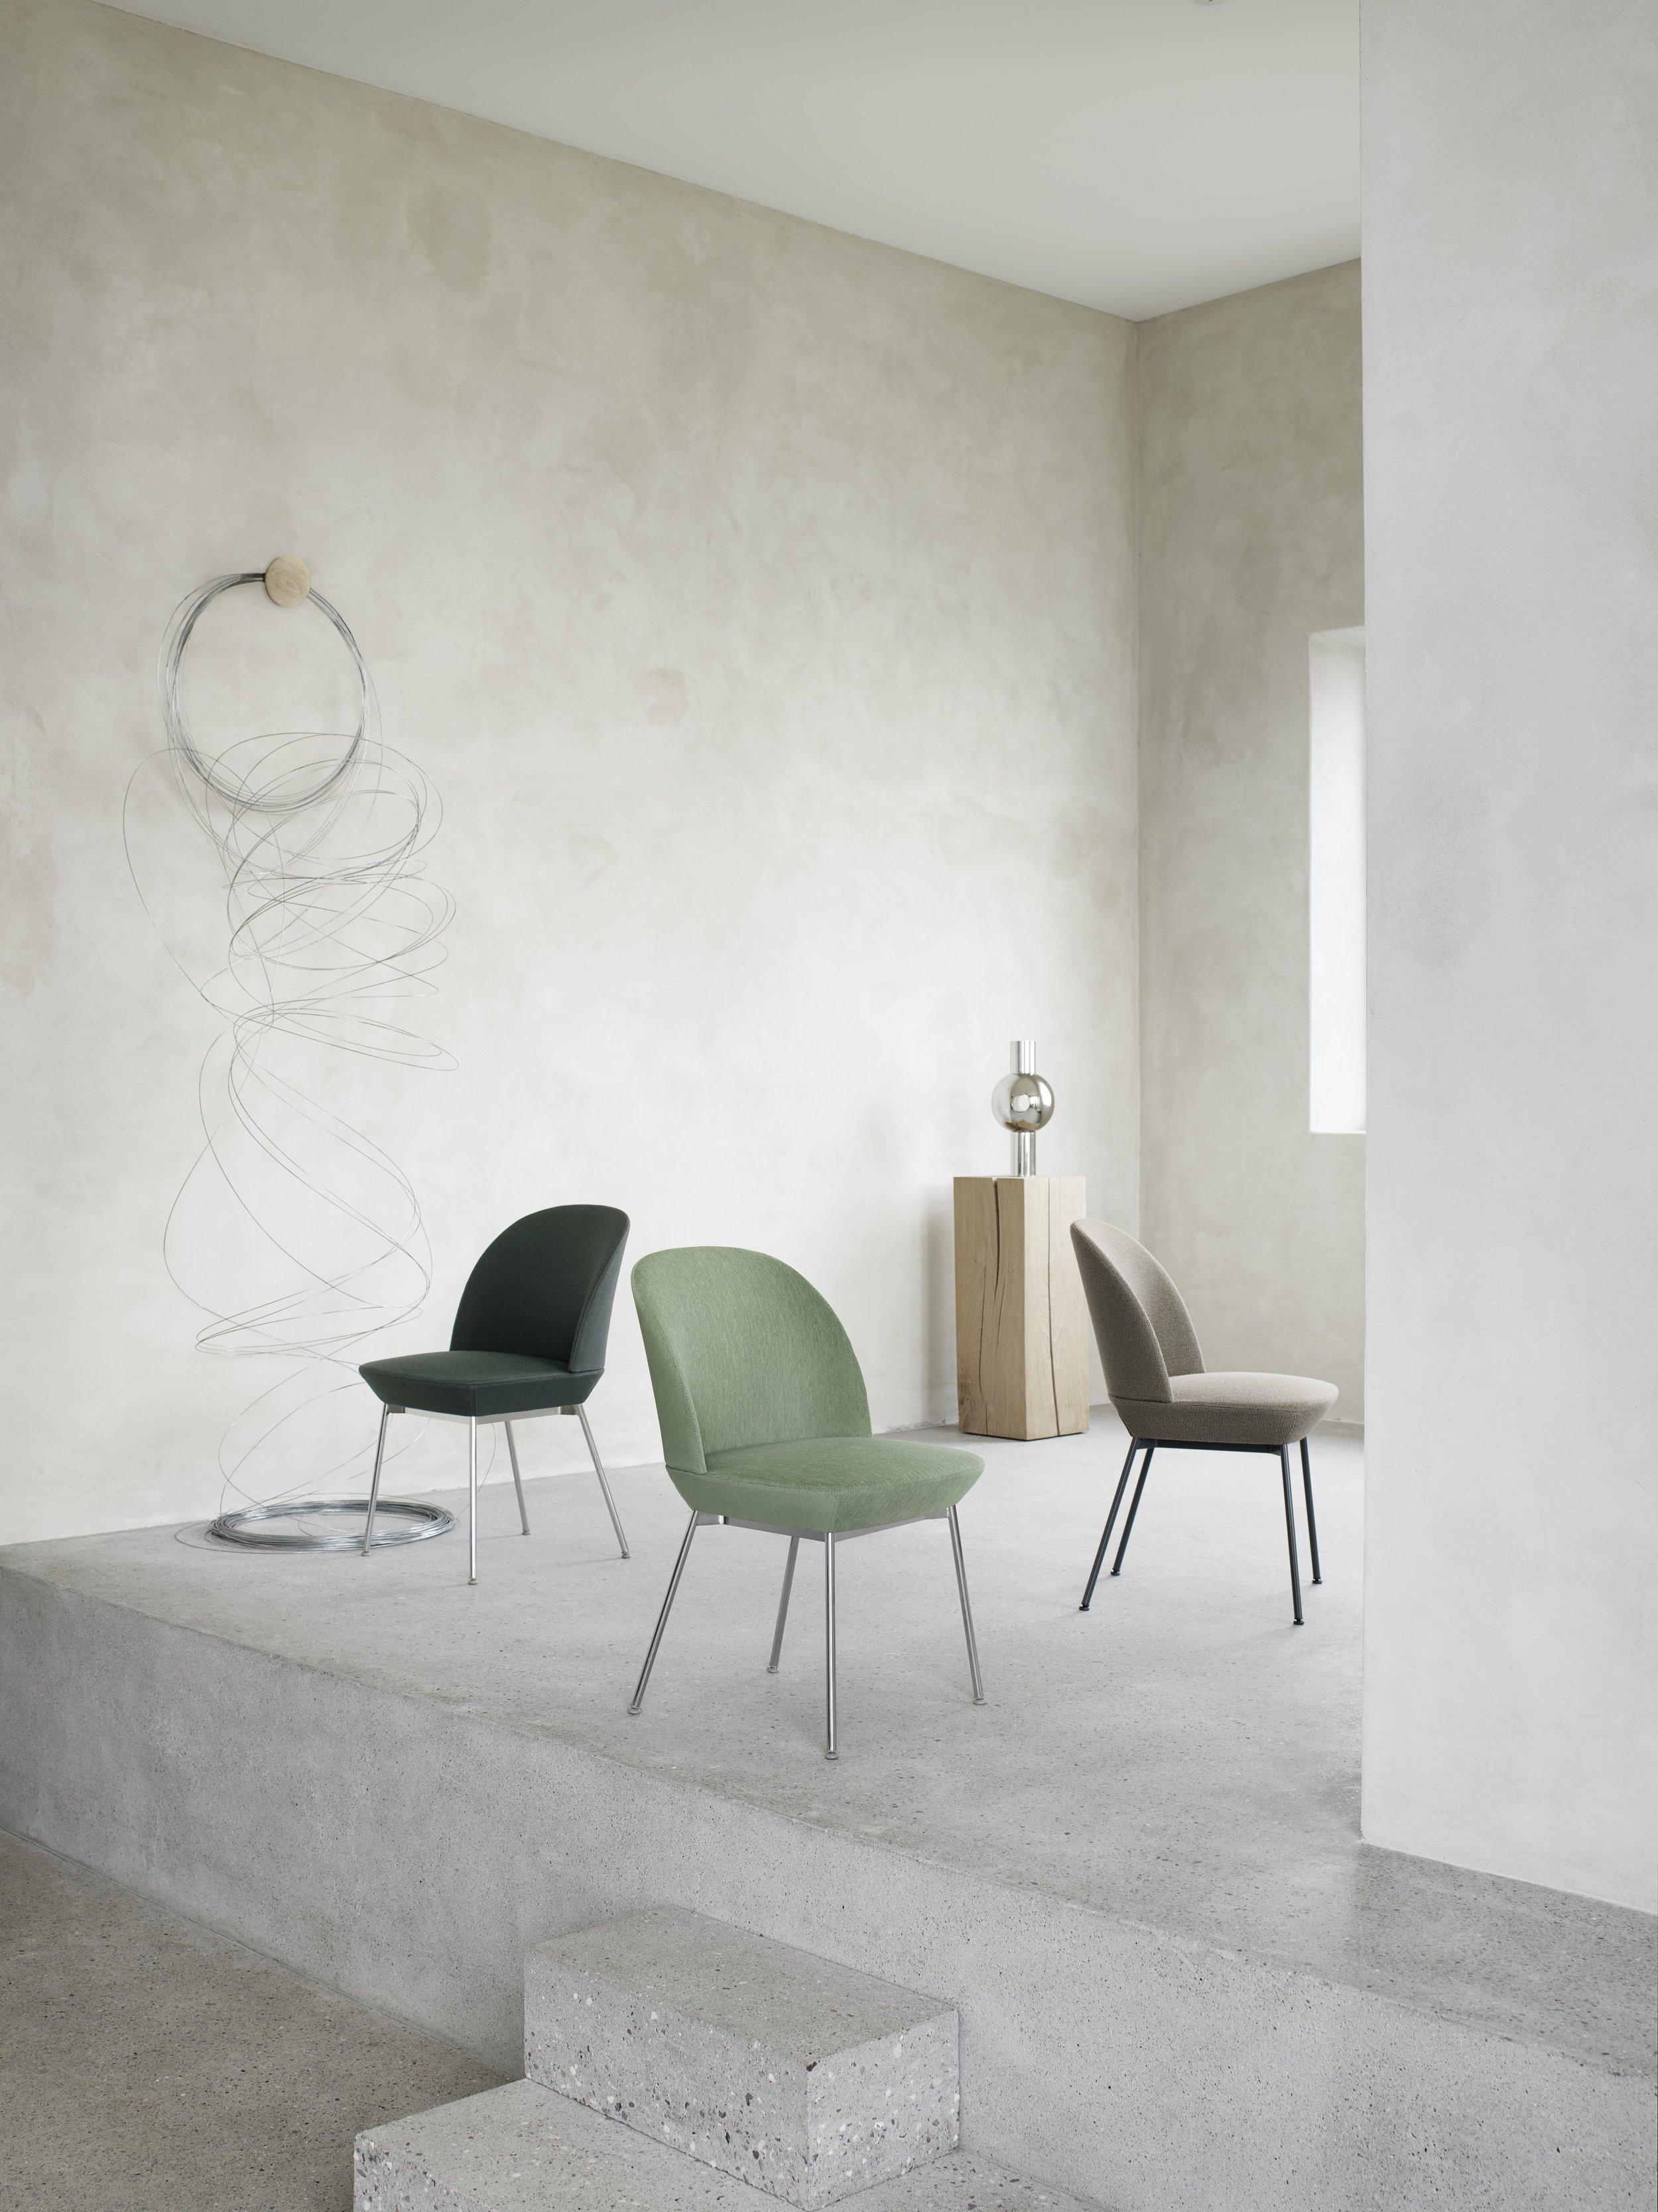 Oslo-side-chair-twill-weave-990-chrome-still-951-chrome-rohleder-ocean-52-anthracie-black-Muuto-org.jpg